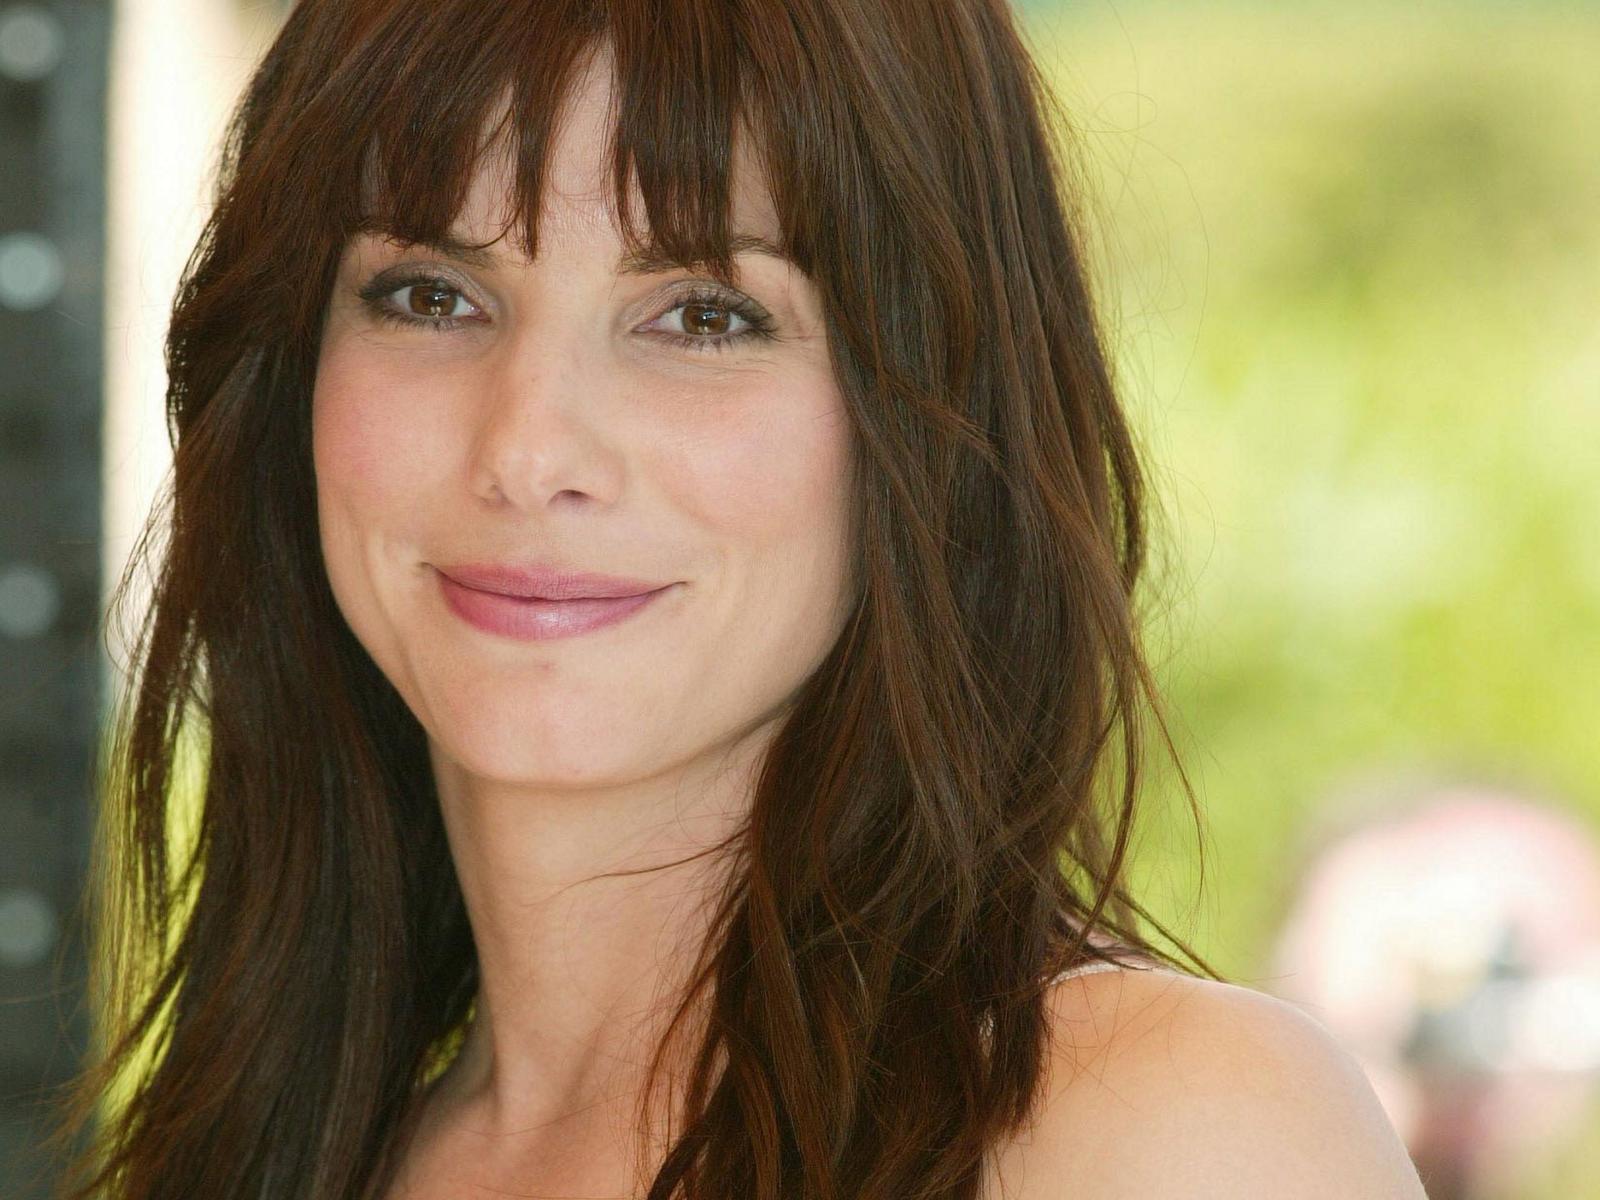 http://3.bp.blogspot.com/-J8yhPFj5RSA/TkP-uRqMabI/AAAAAAAAEIw/wIX_wyhRBOQ/s1600/Sandra_Bullock_Wallpapers_beautyful_body_face_and_eyes%2B%25284%2529.jpg